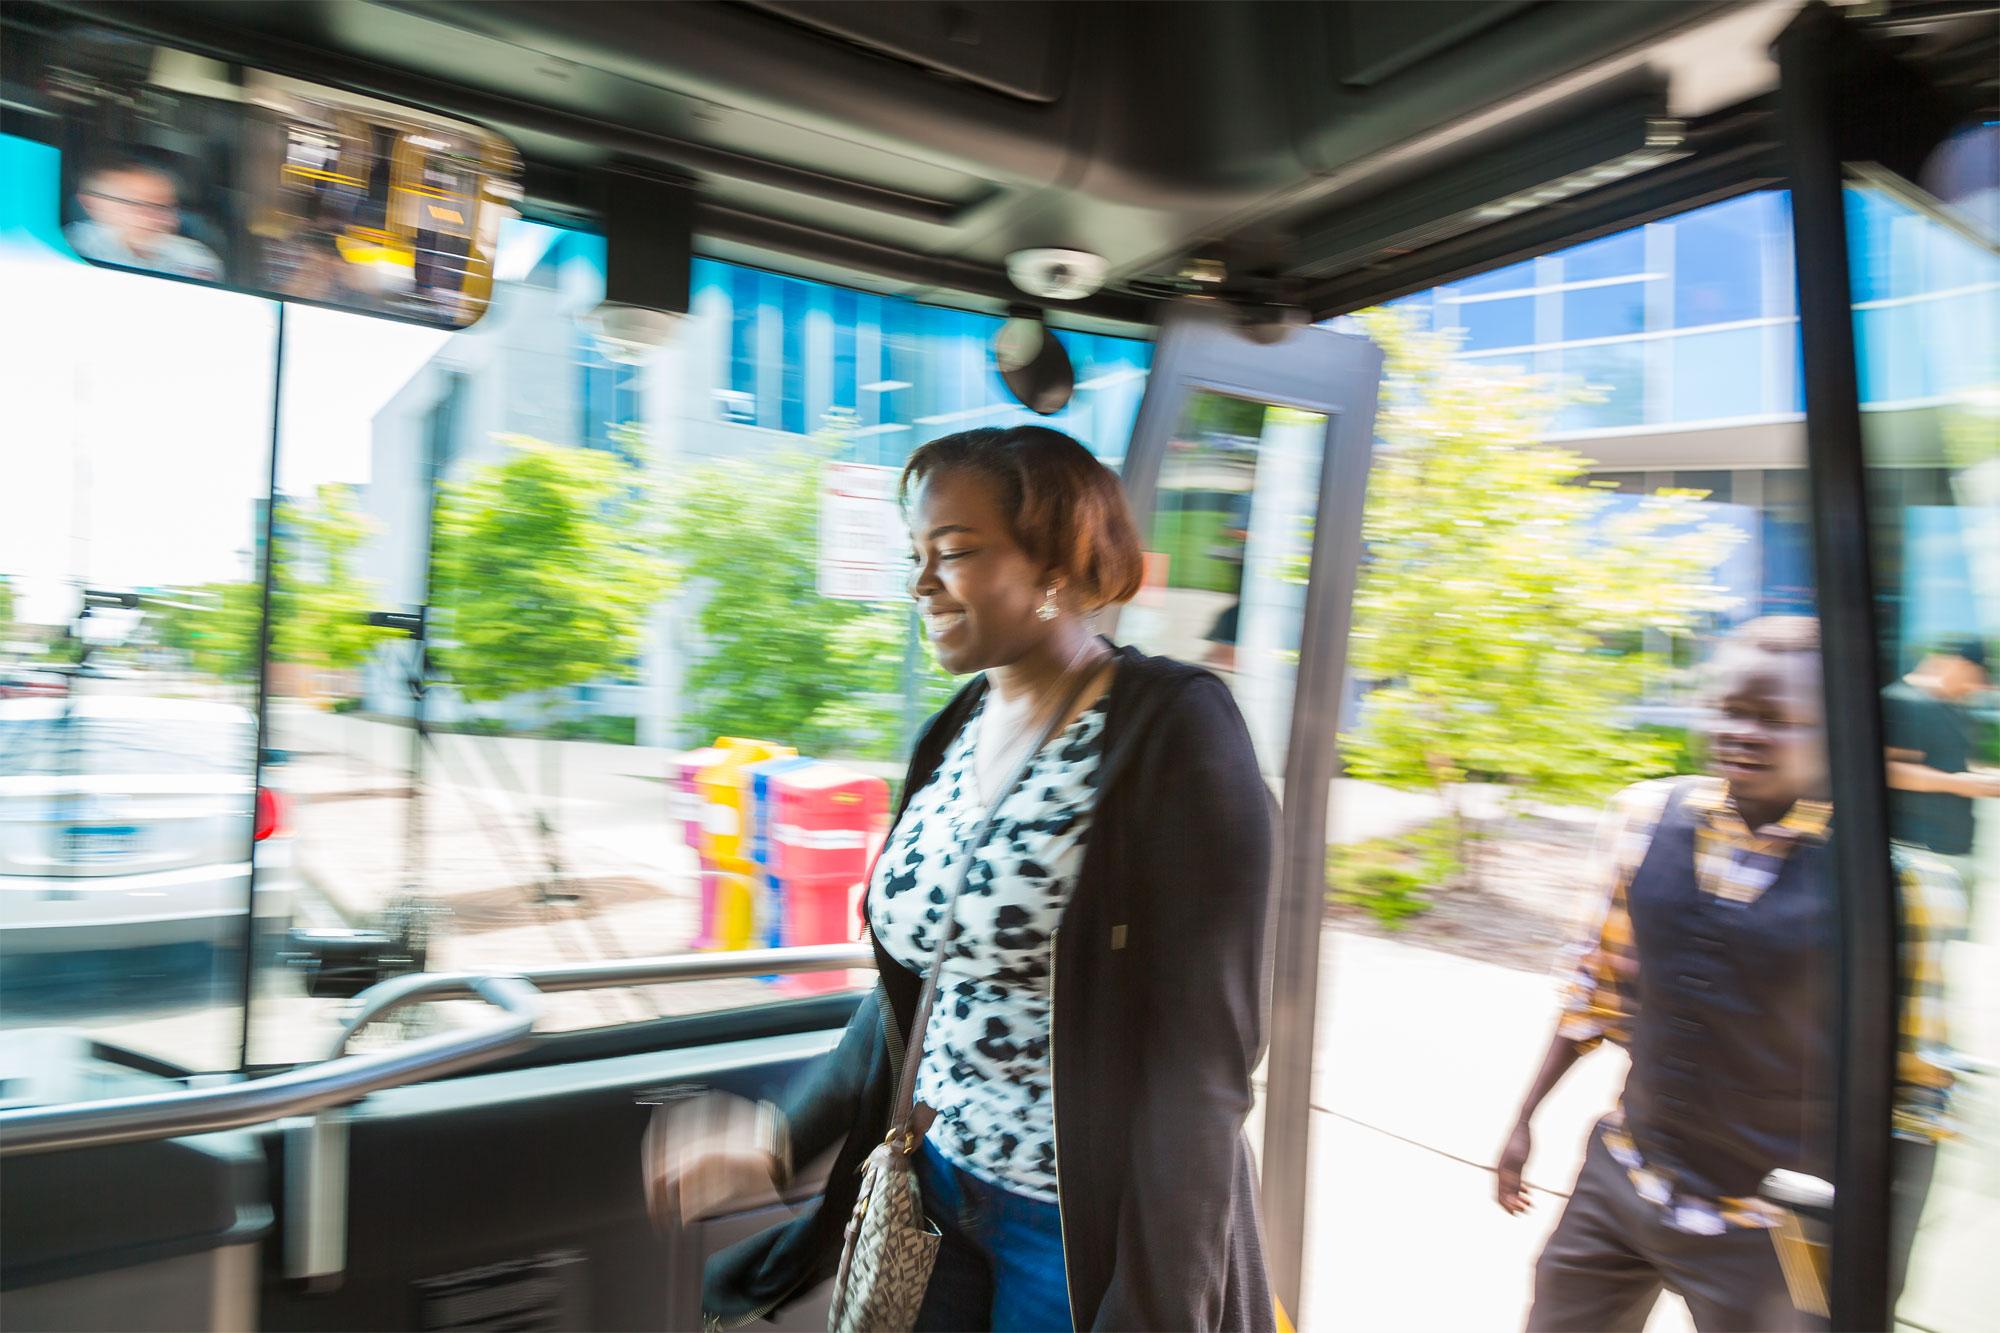 IMAGE: Passengers Boarding Metro Bus